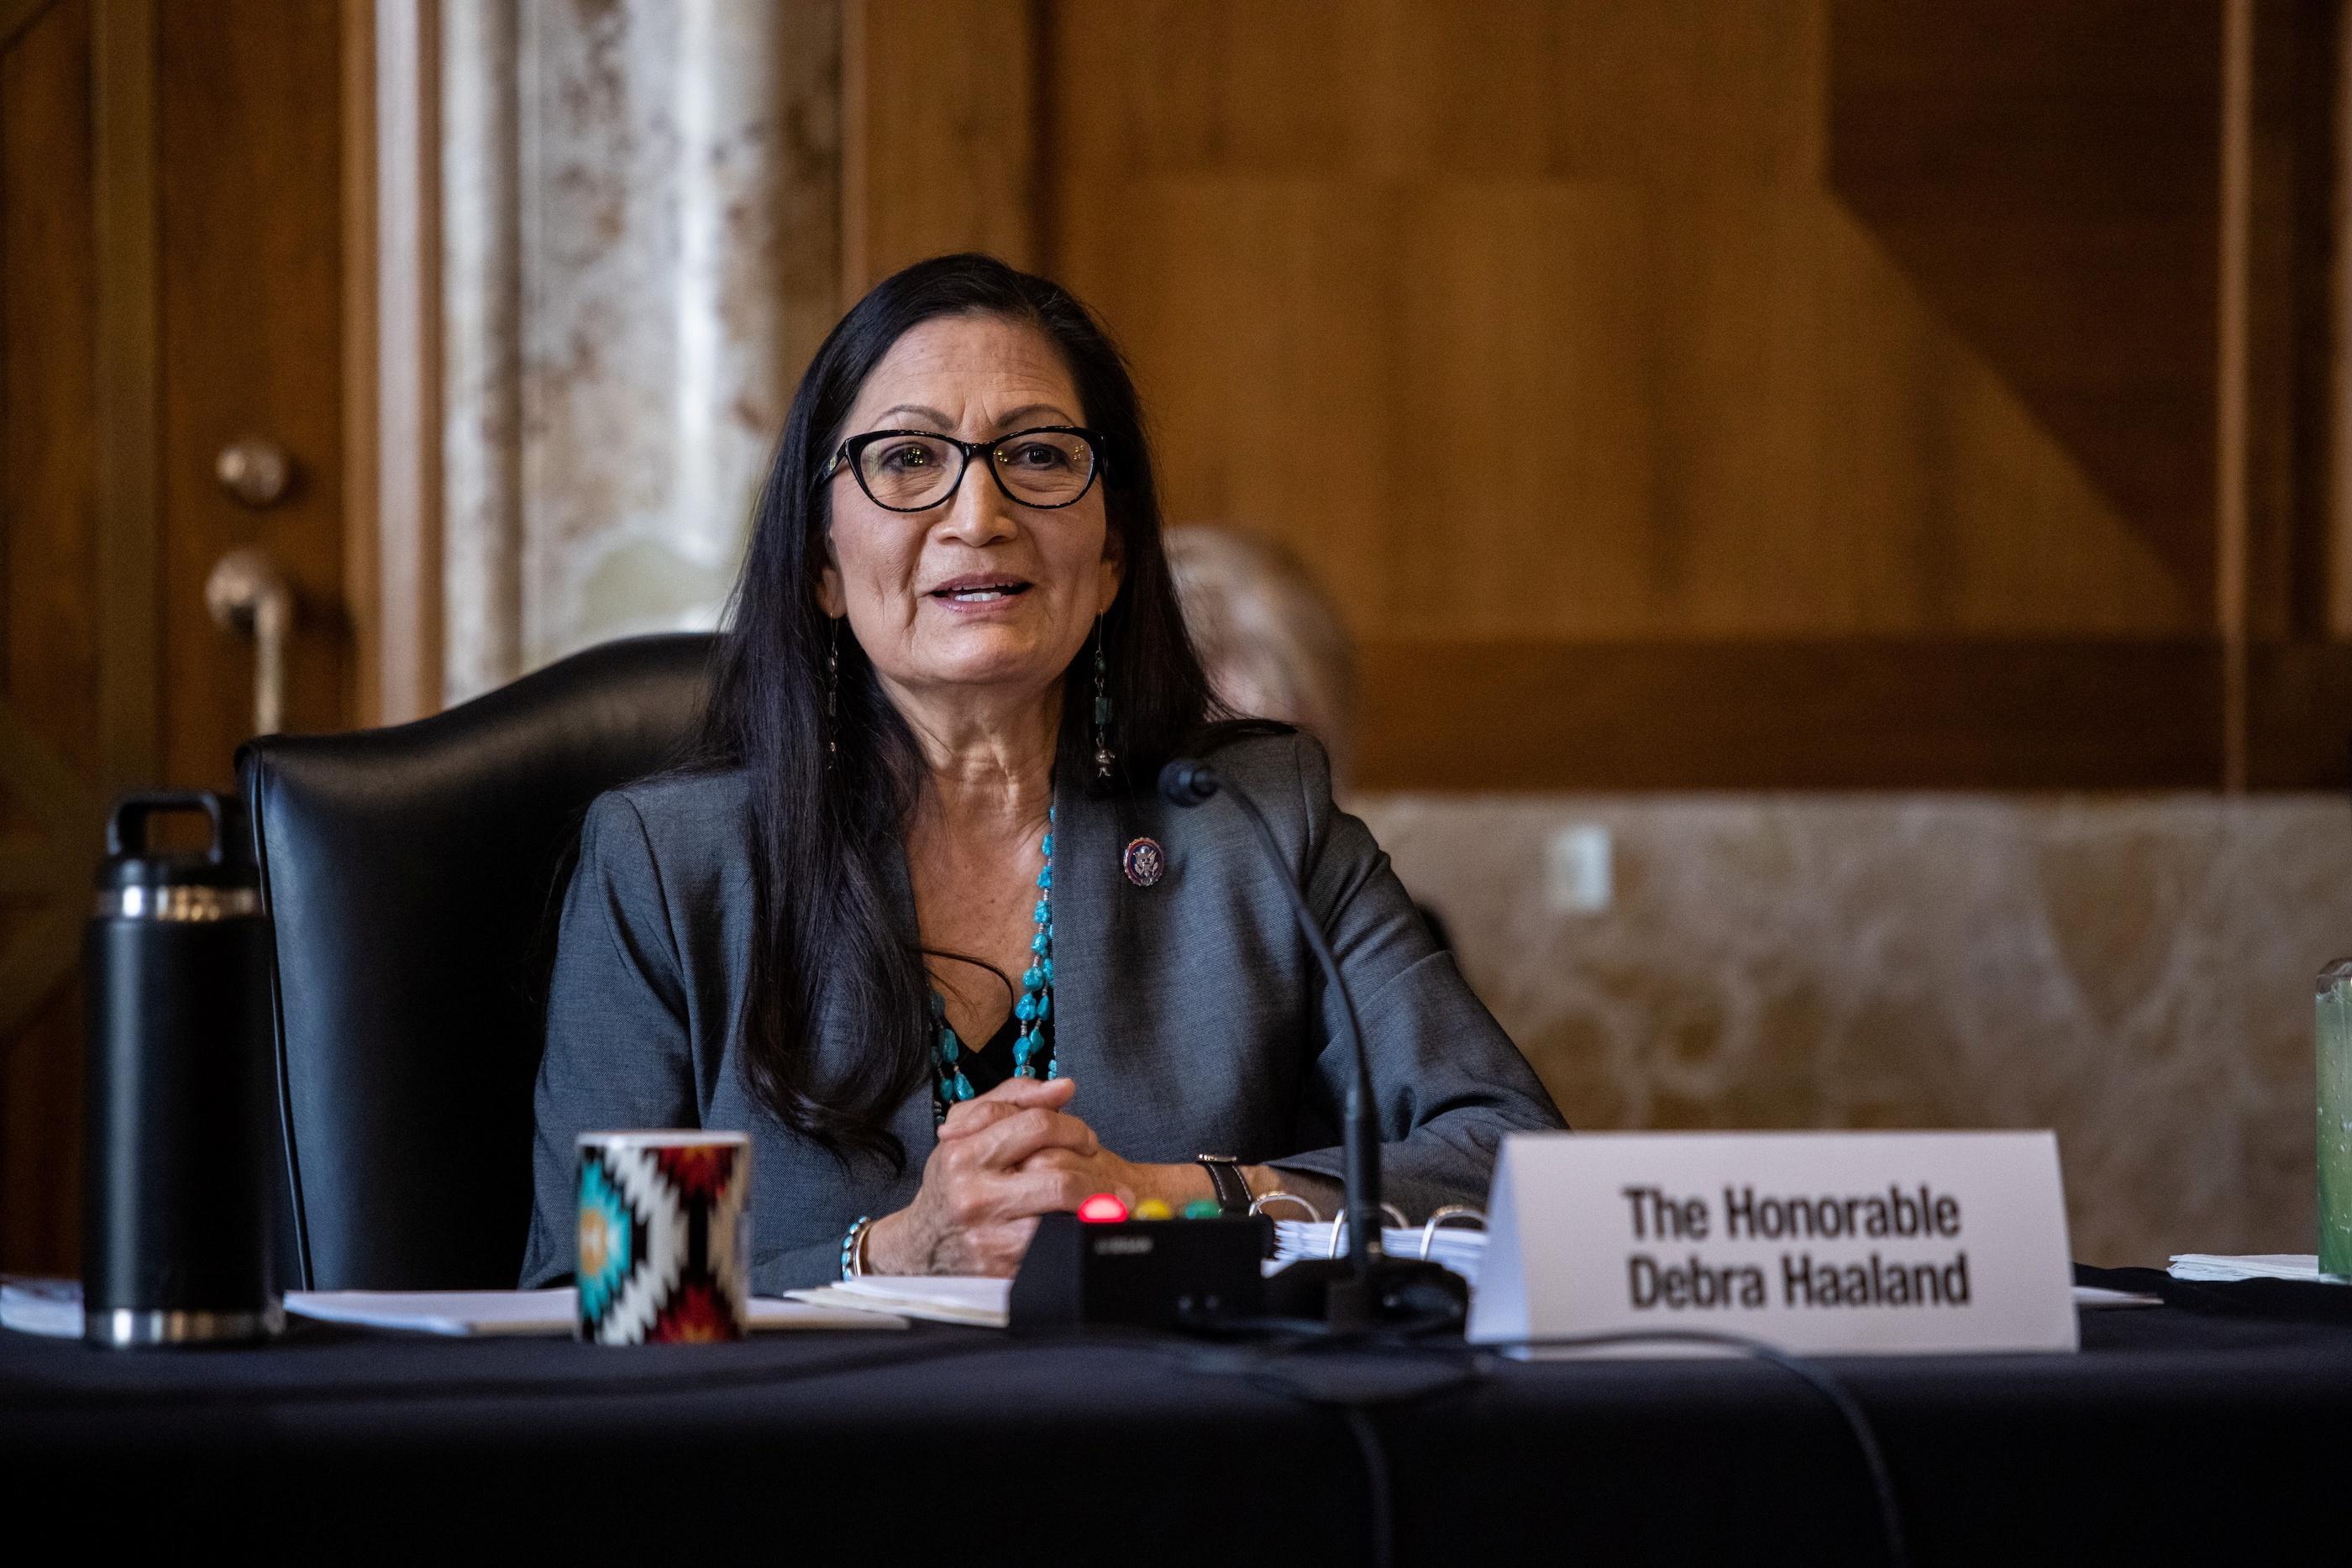 Sec. Haaland on the value of Native American representation